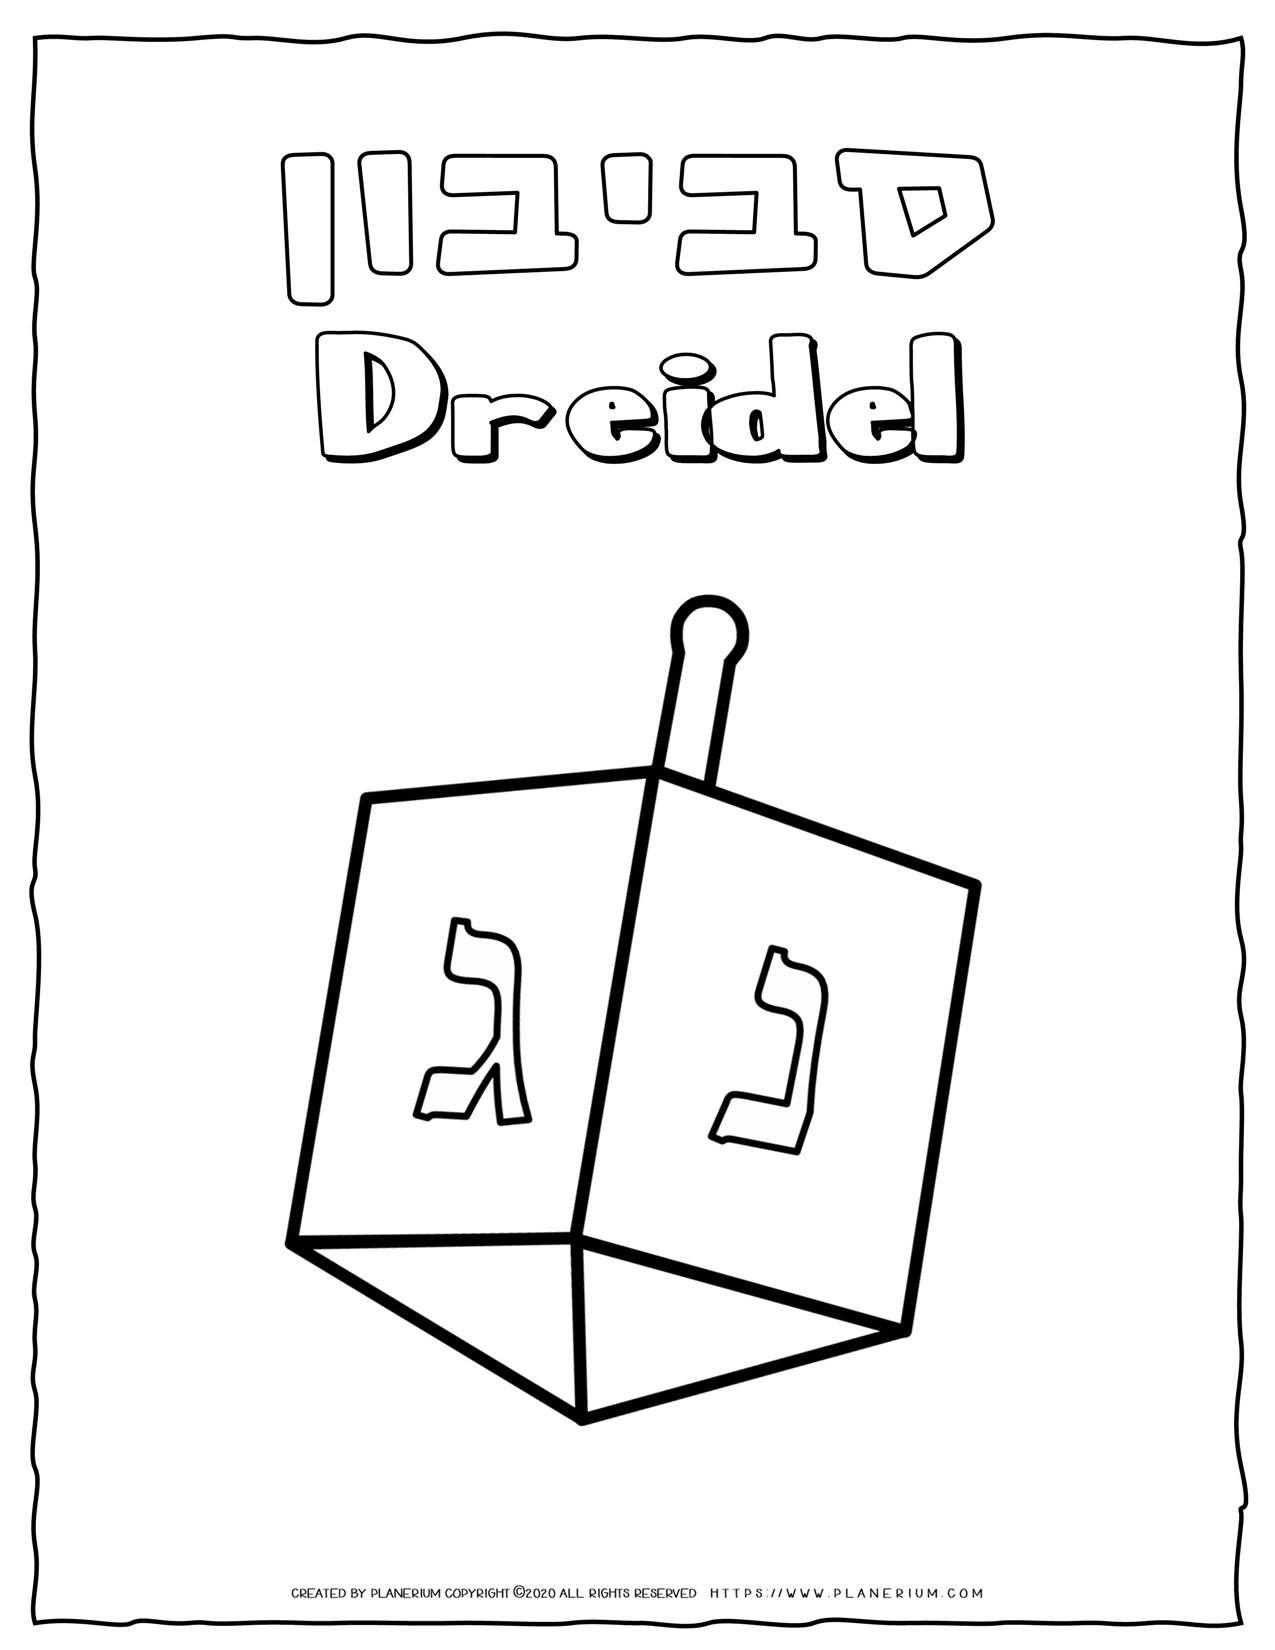 Dreidel Coloring Page Free Printable Planerium Dreidel Free Printables Coloring Pages [ 1650 x 1275 Pixel ]